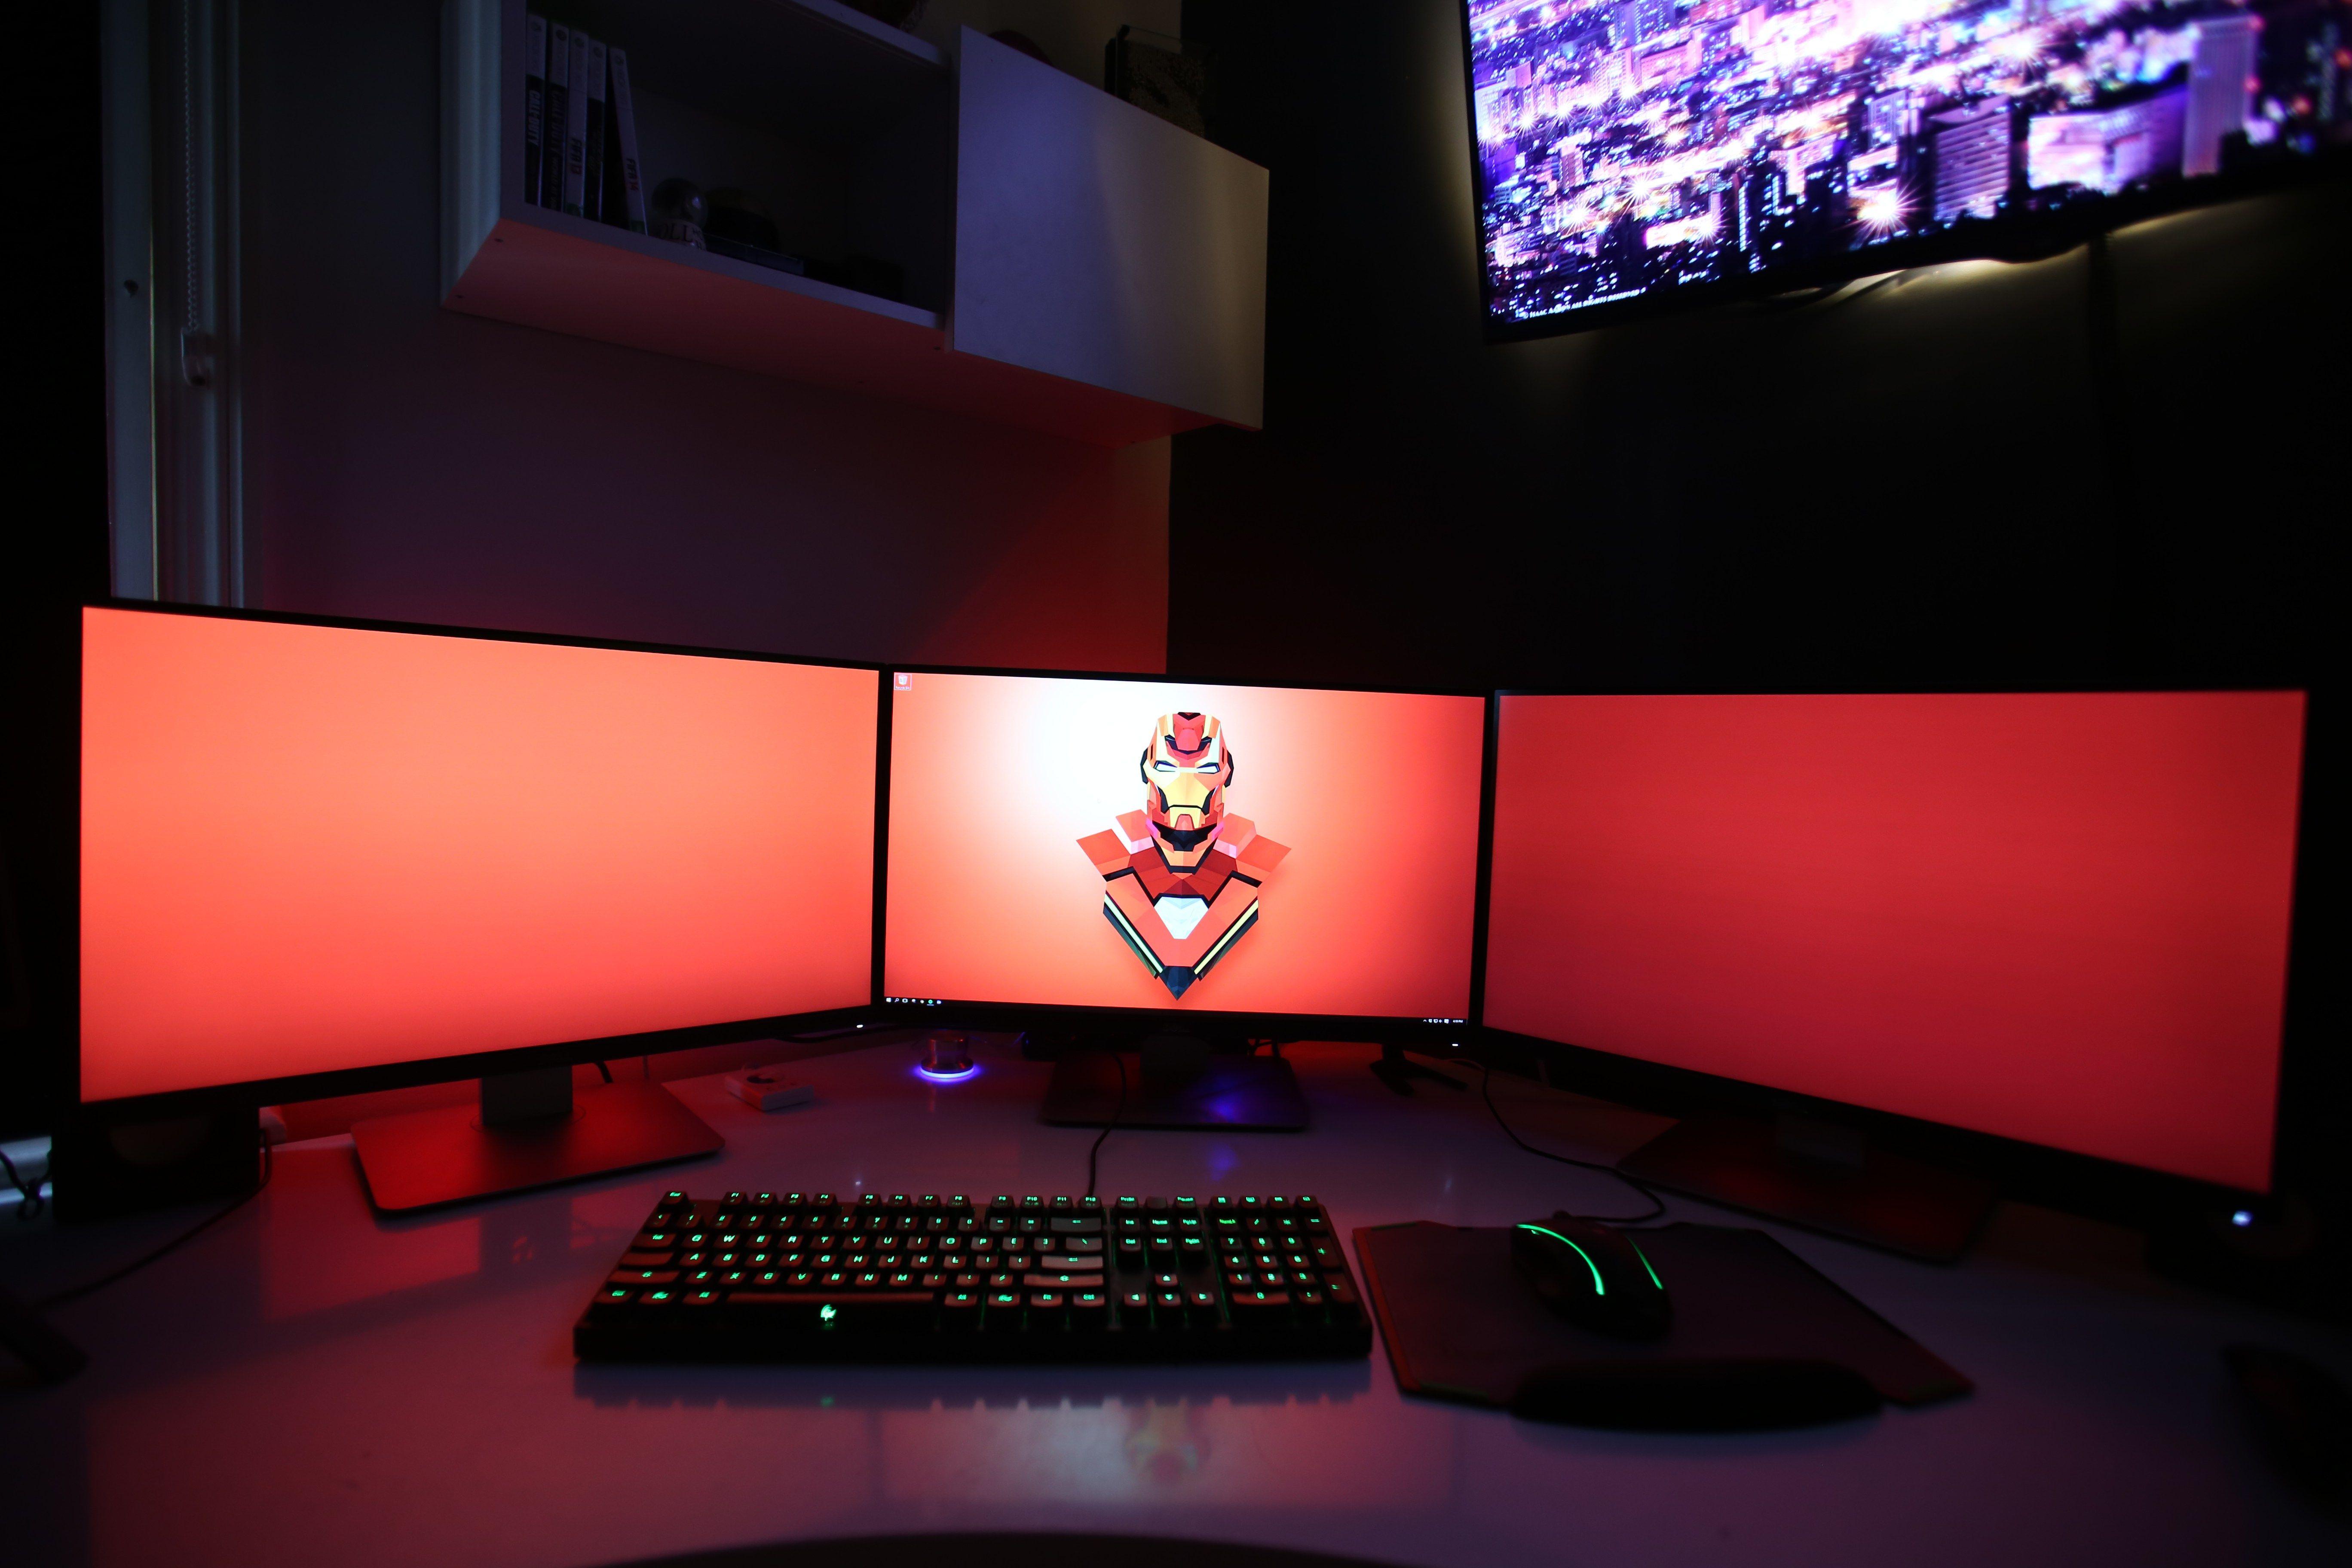 Triple Monitor Stand 27 Inch Desk Monitor Desk Mount Arm